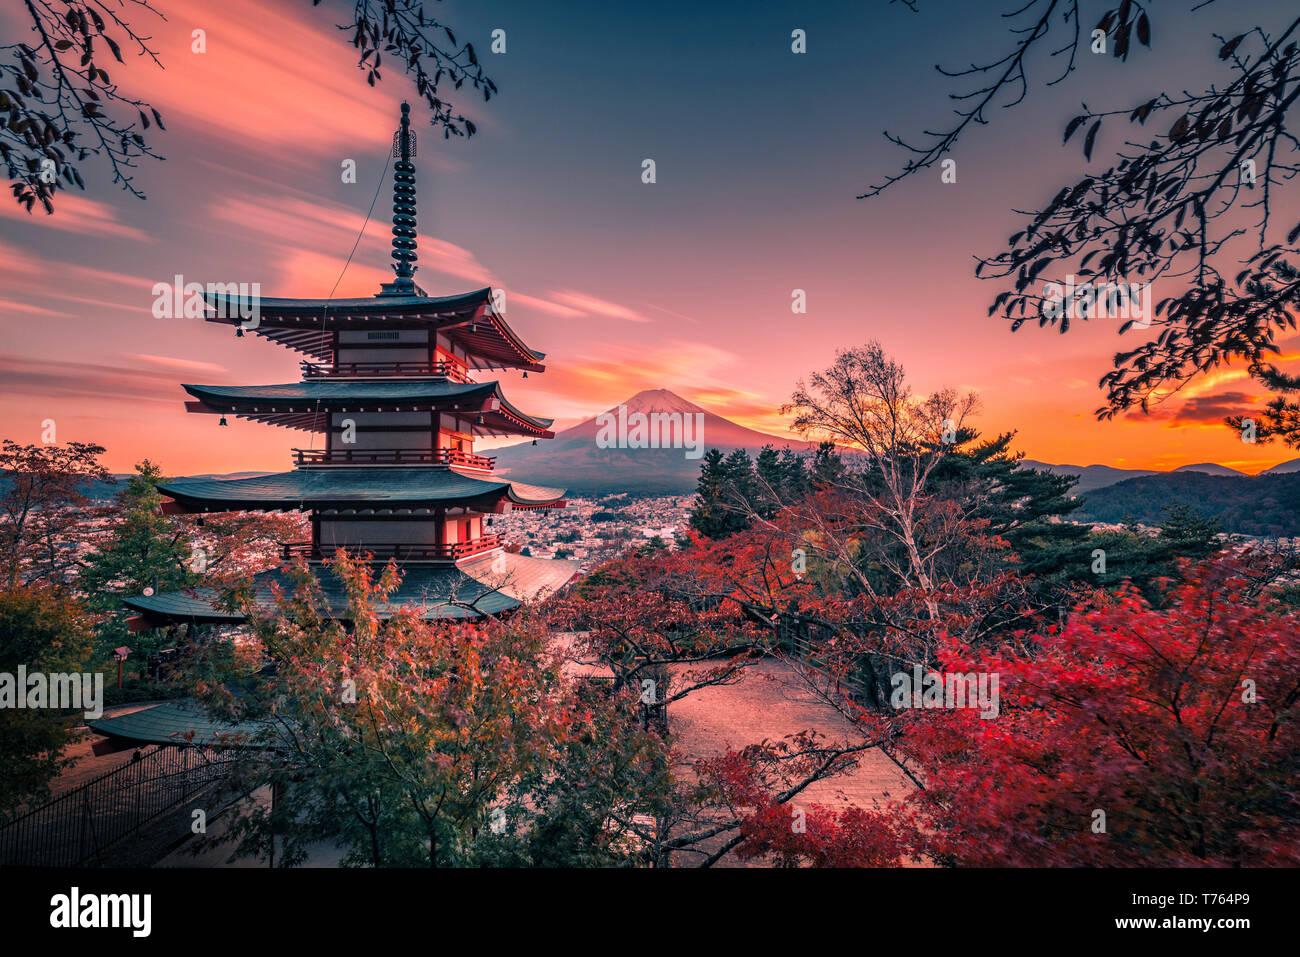 Mt. Fuji with Chureito Pagoda and red leaf in the autumn on sunset at Fujiyoshida, Japan. Stock Photo